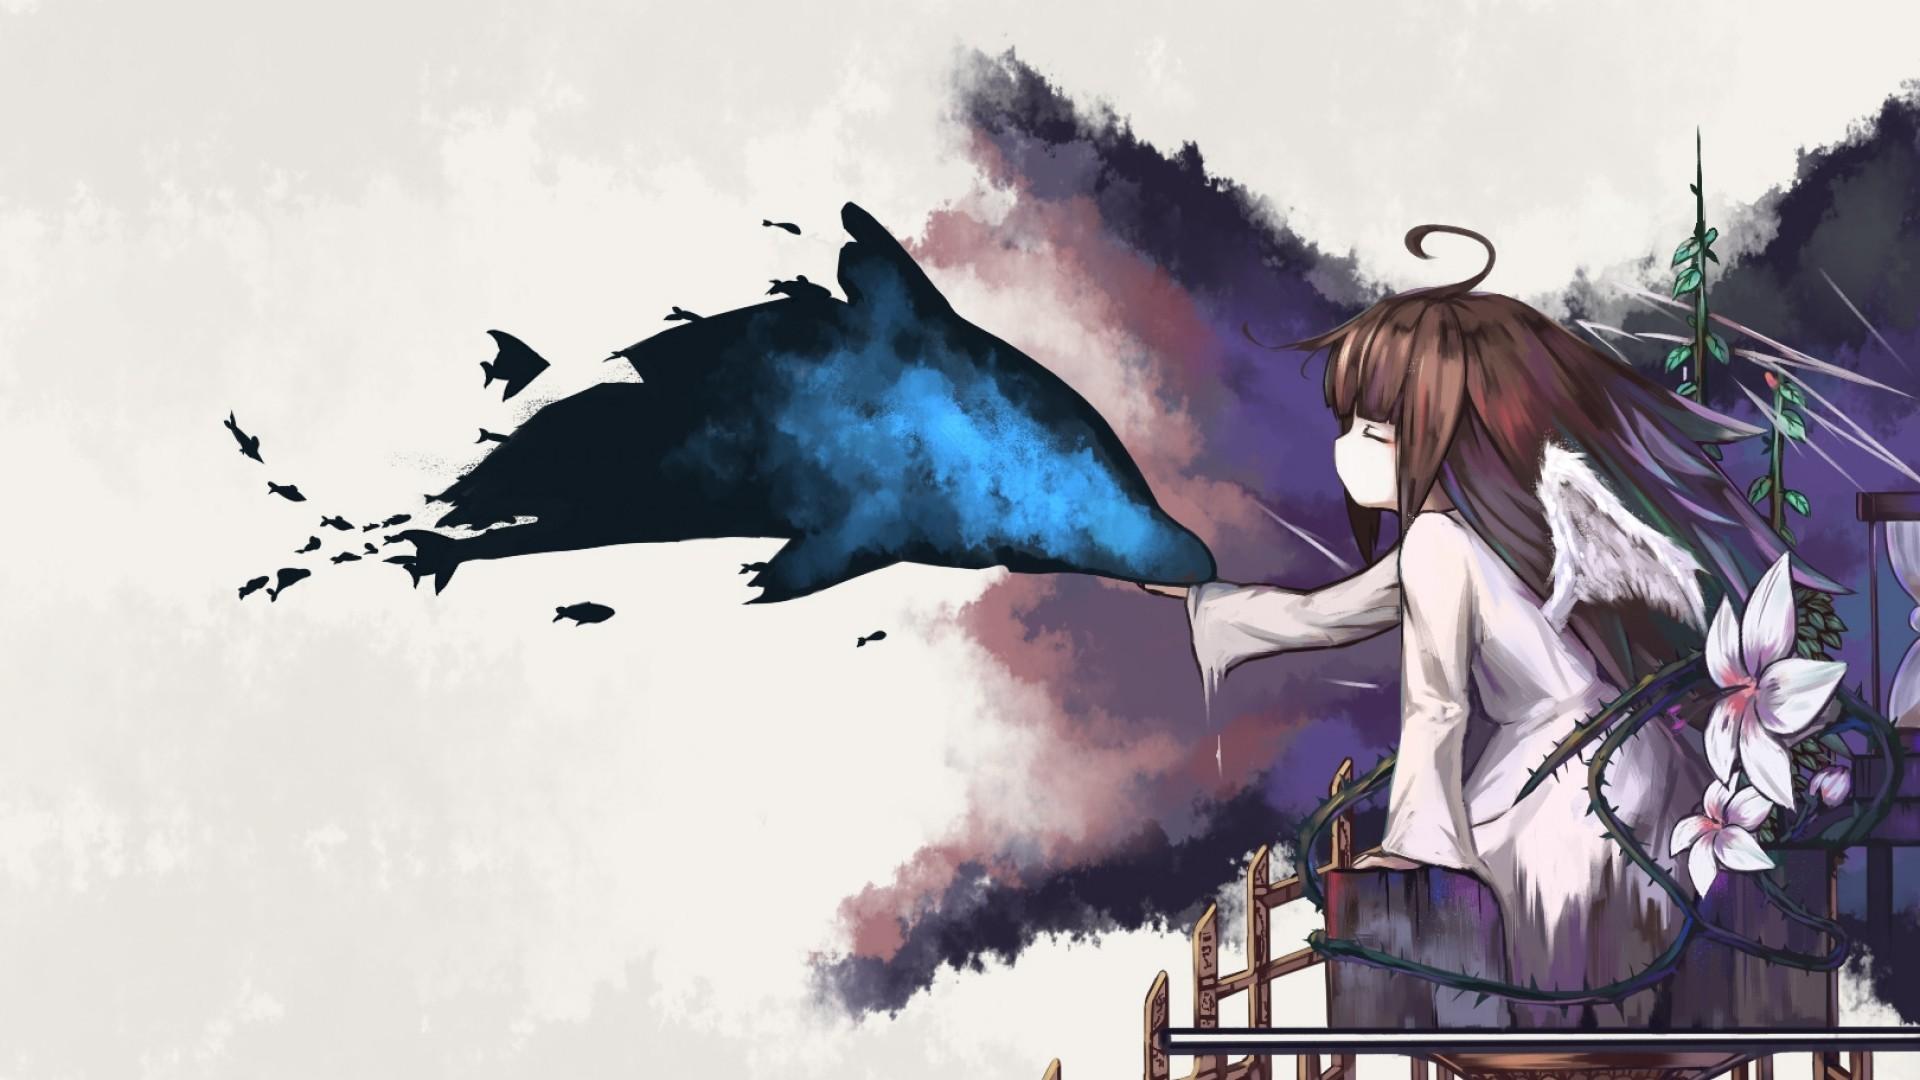 Deemo, Wings, Artistic, Anime Girl, Anime Style